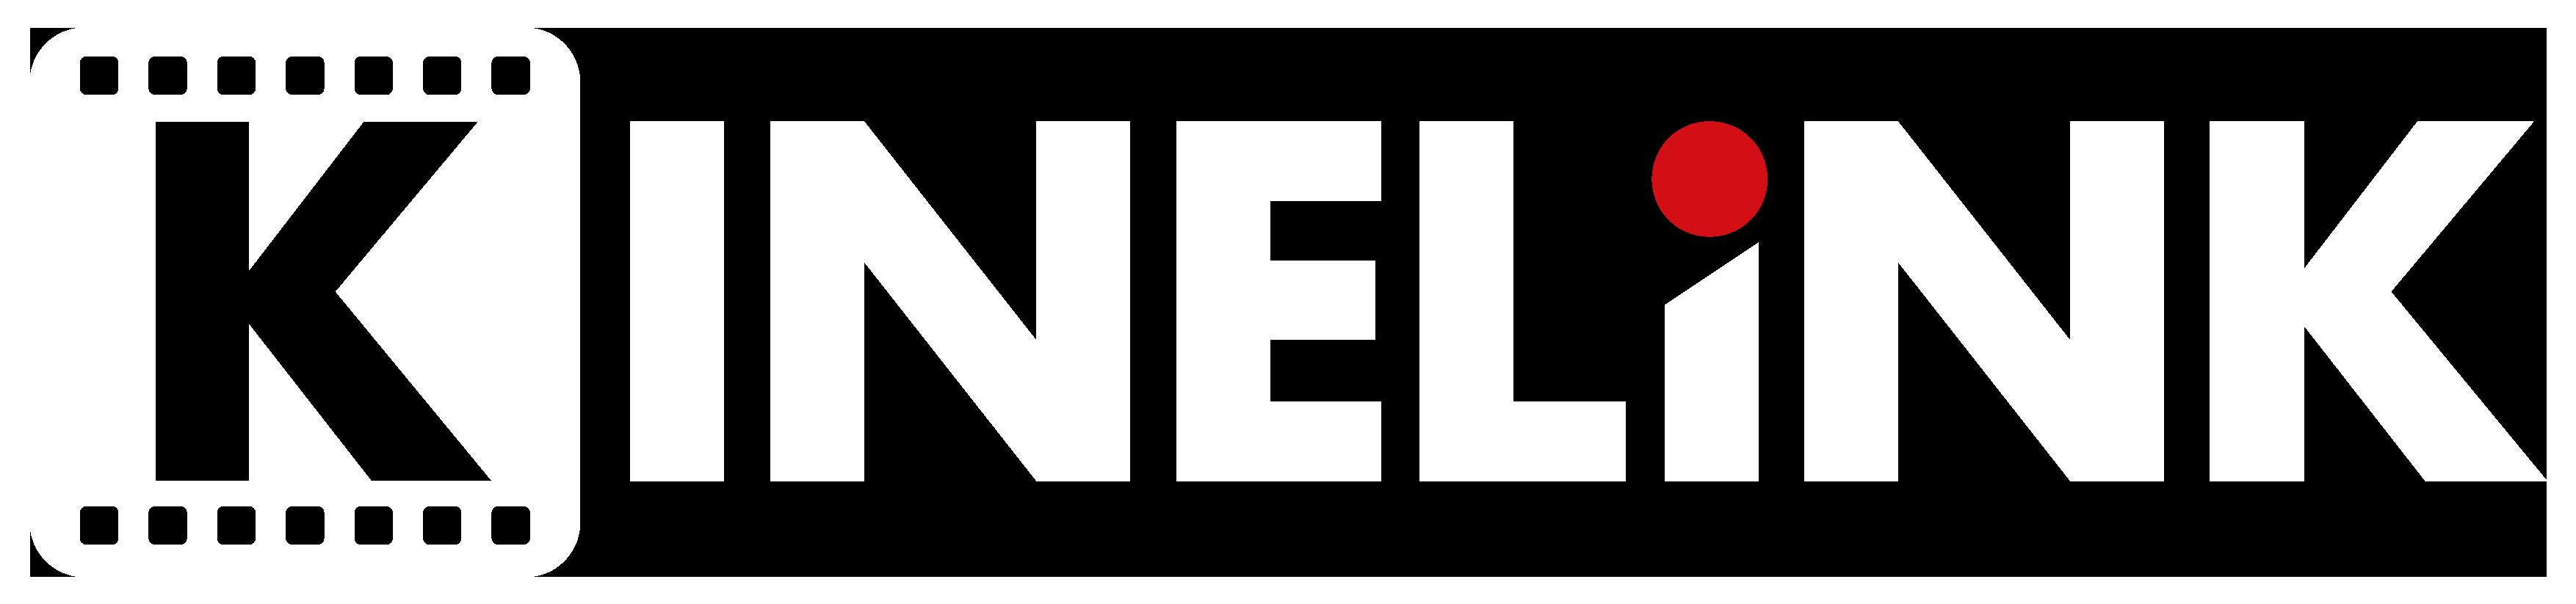 kinelink_logo_alb